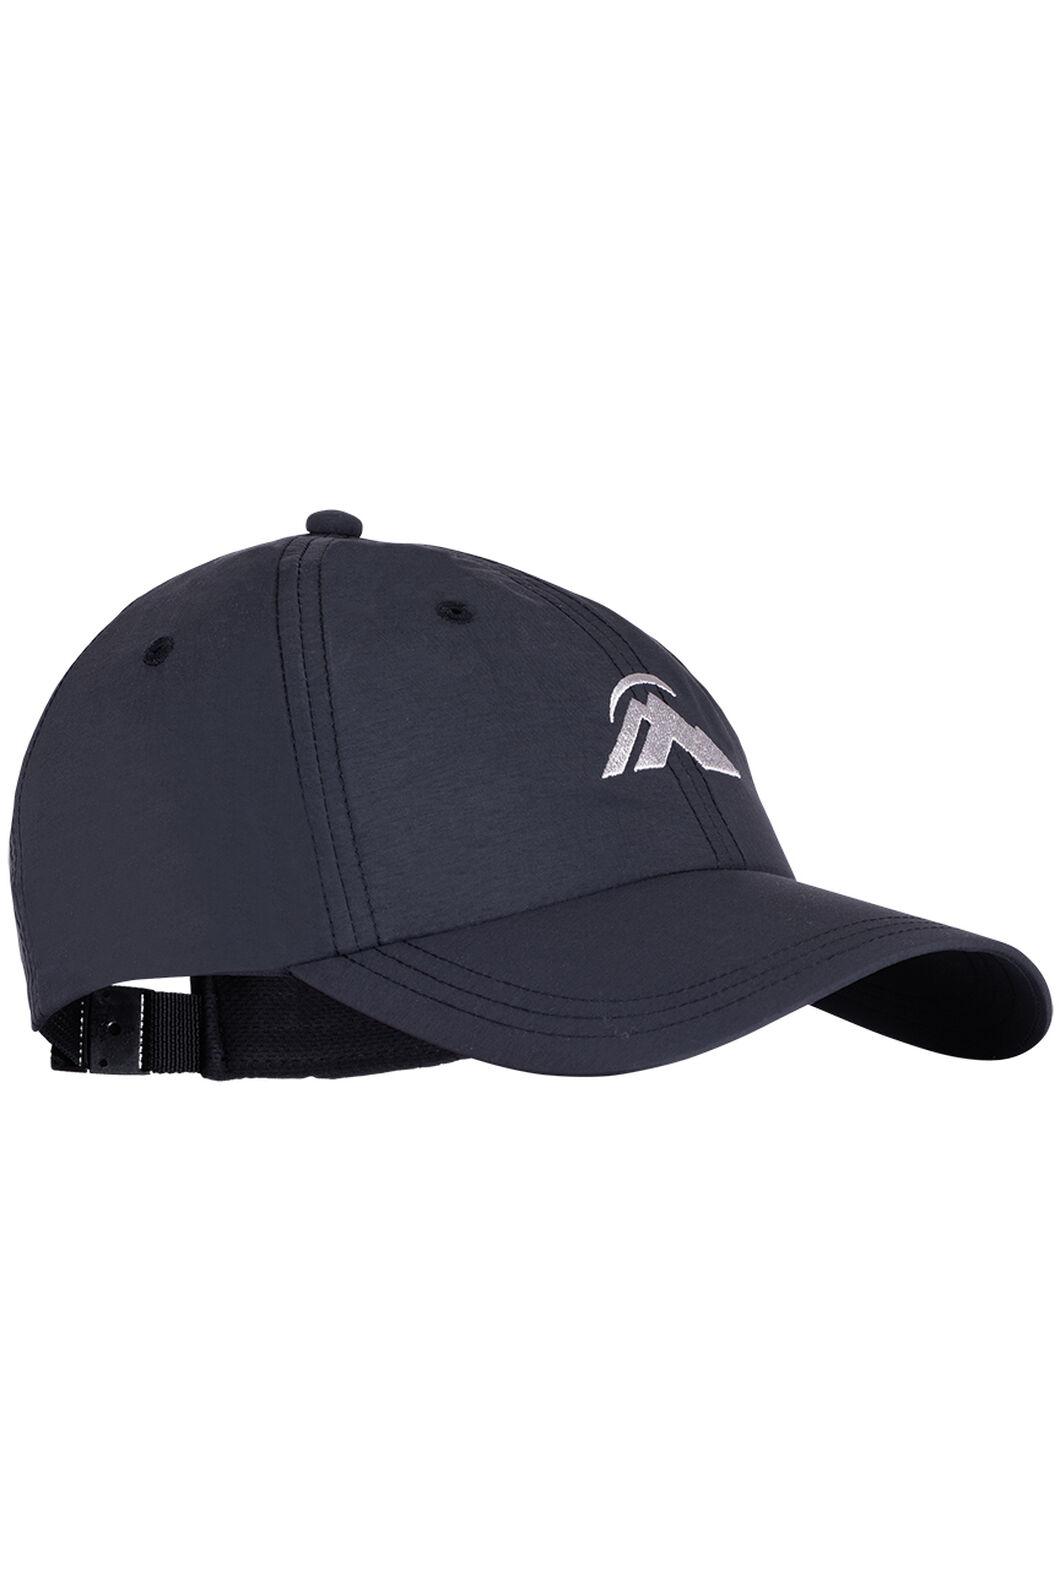 Macpac Mini Hiker Cap, Black, hi-res